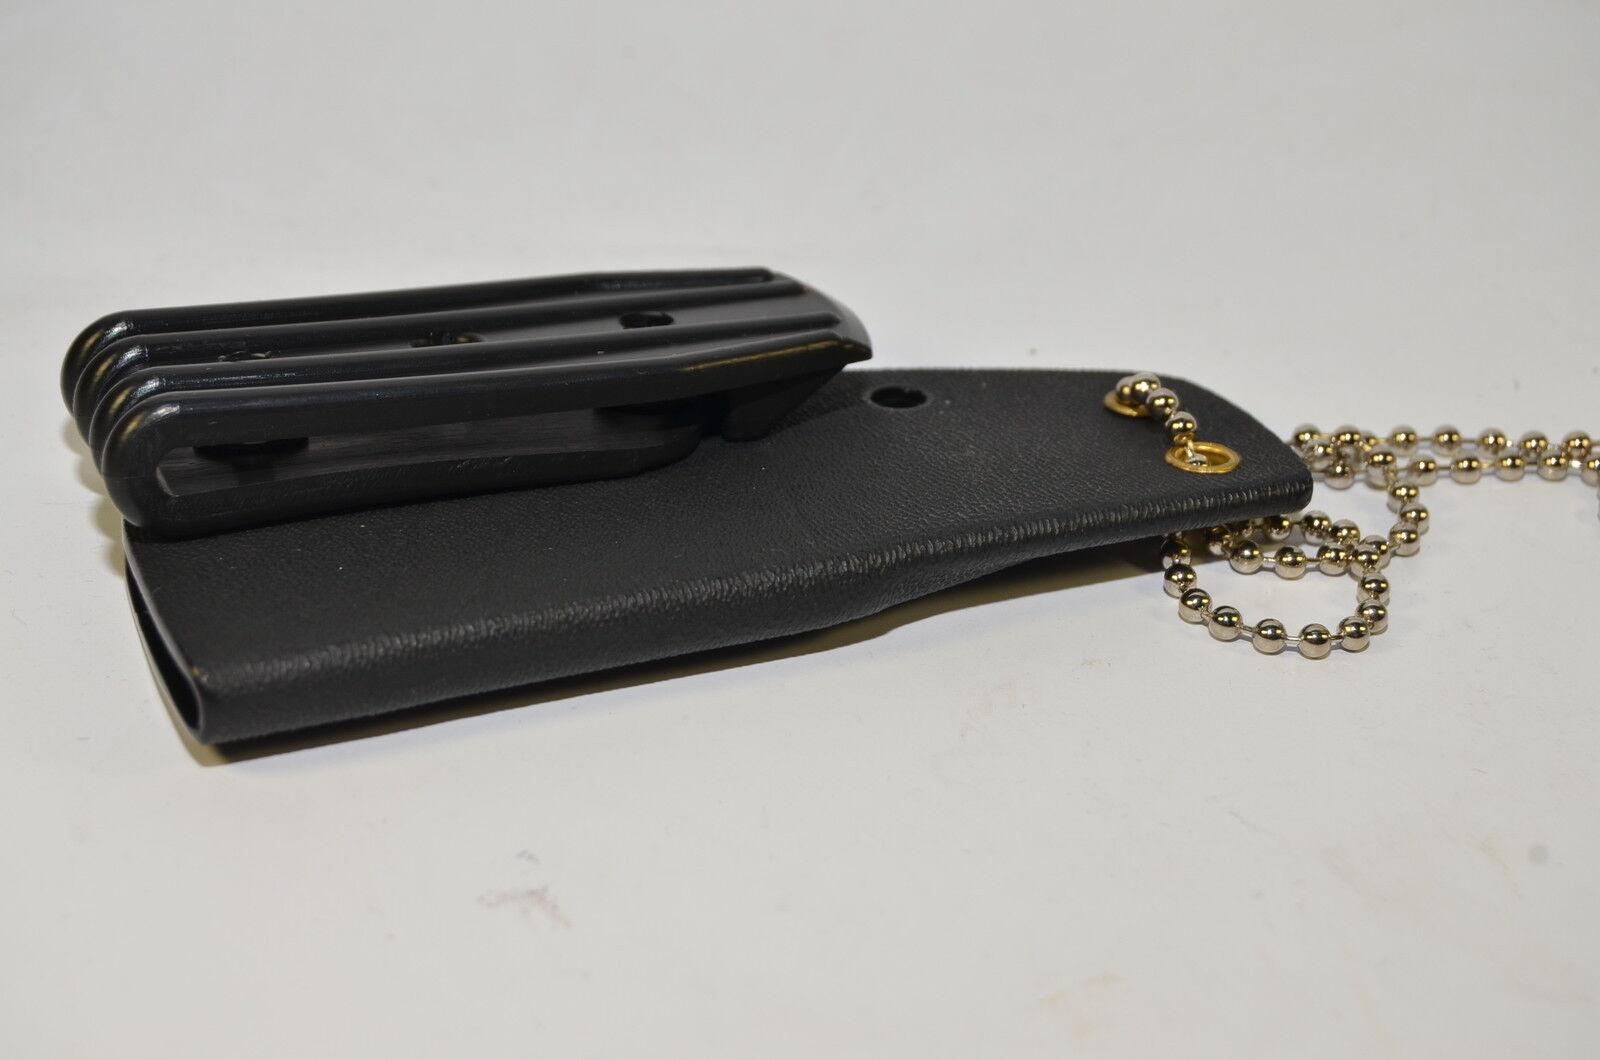 Tops Knives ruana American smoke jumper collectionneur couteau EDC EDC EDC couteau escamotable c16866